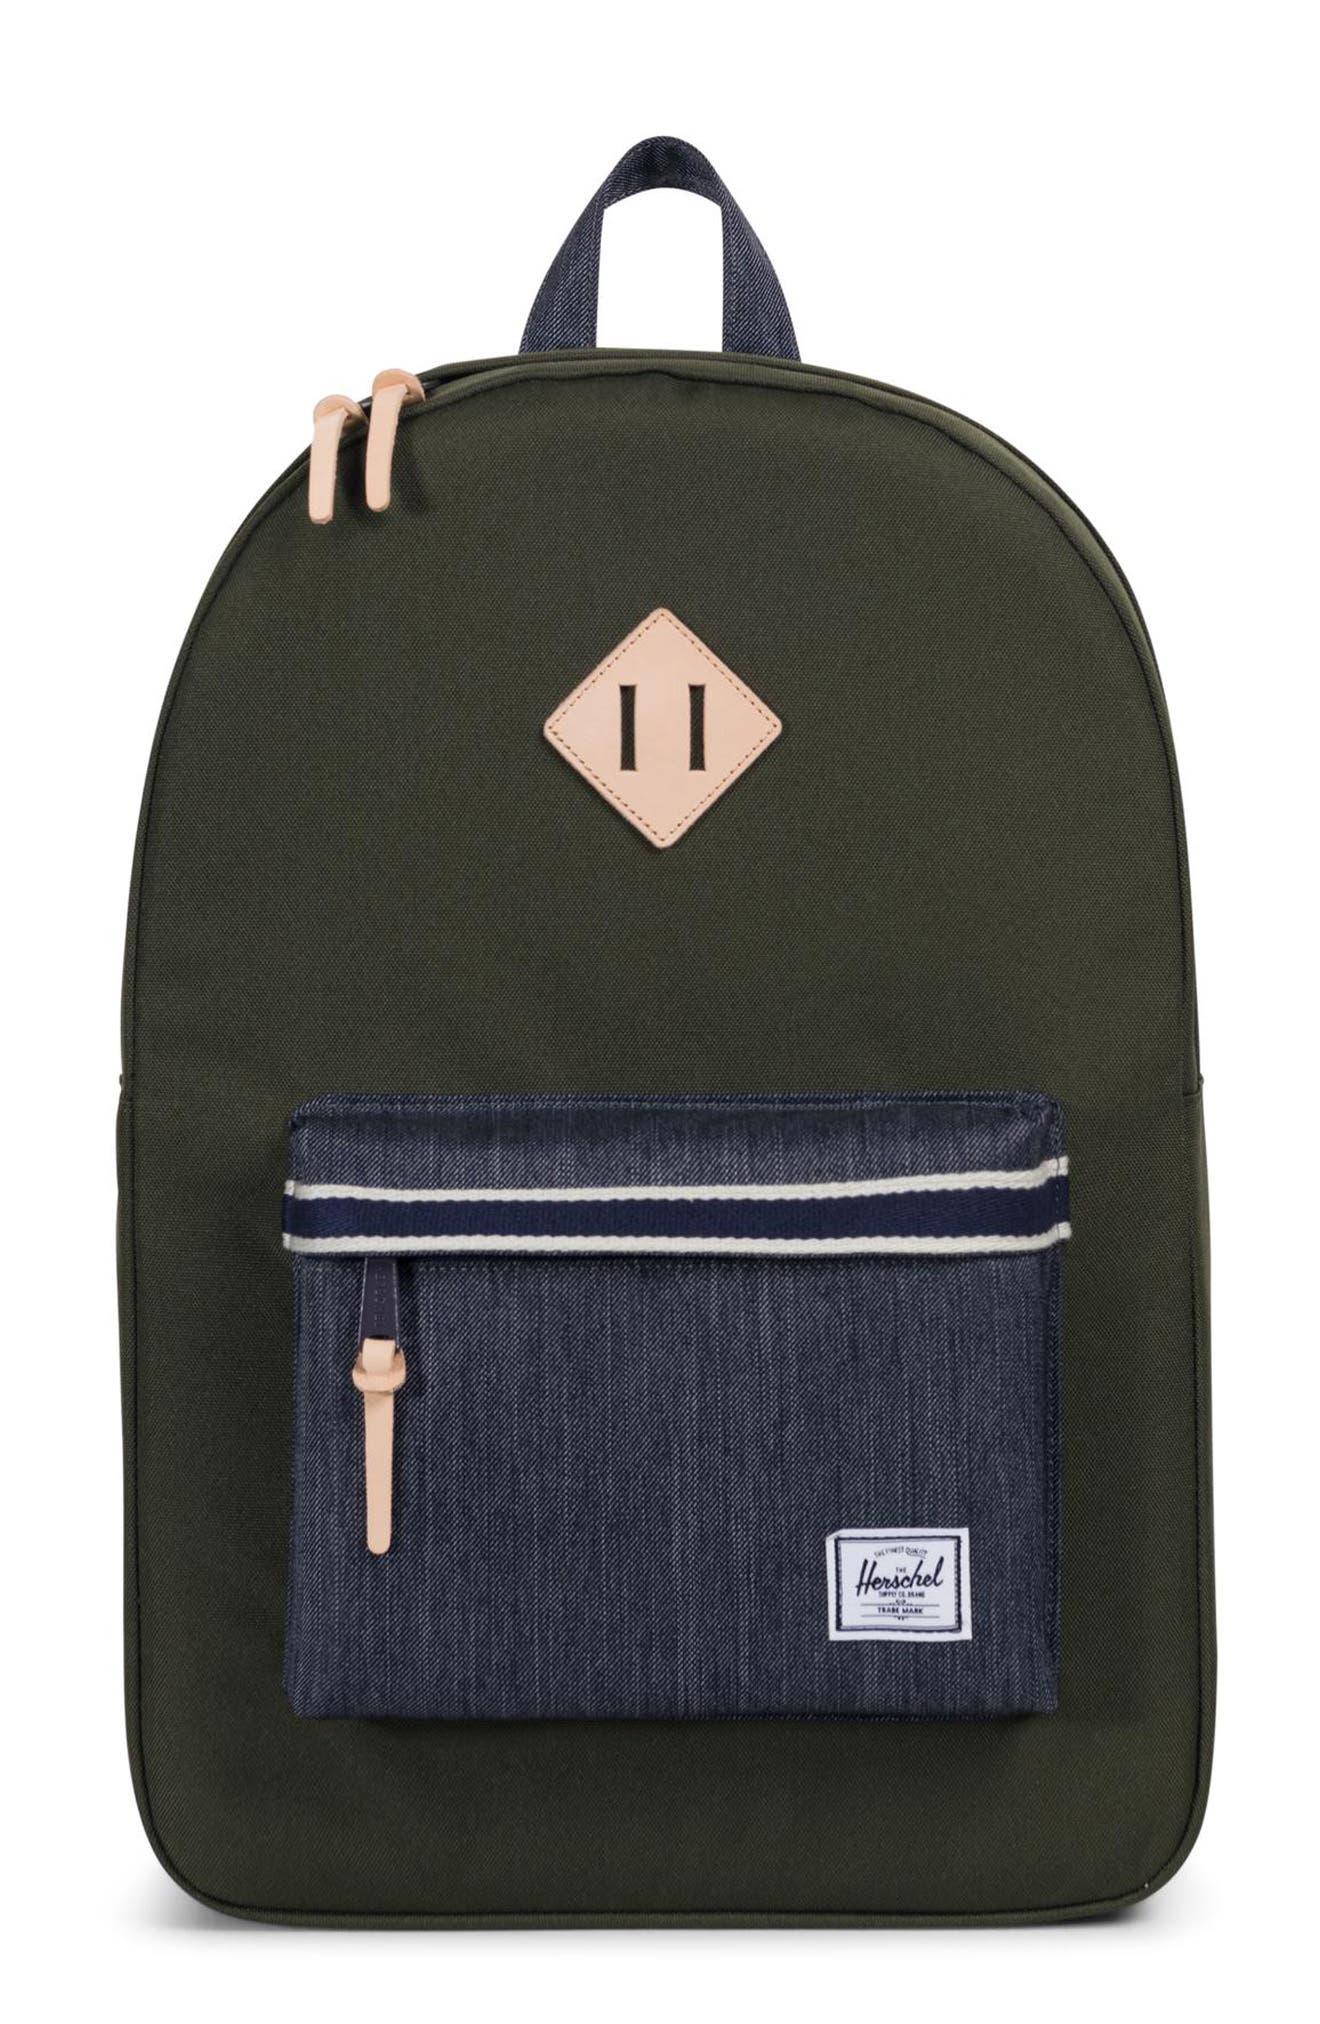 Heritage Offset Denim Backpack,                             Main thumbnail 1, color,                             FOREST NIGHT/ DARK DENIM